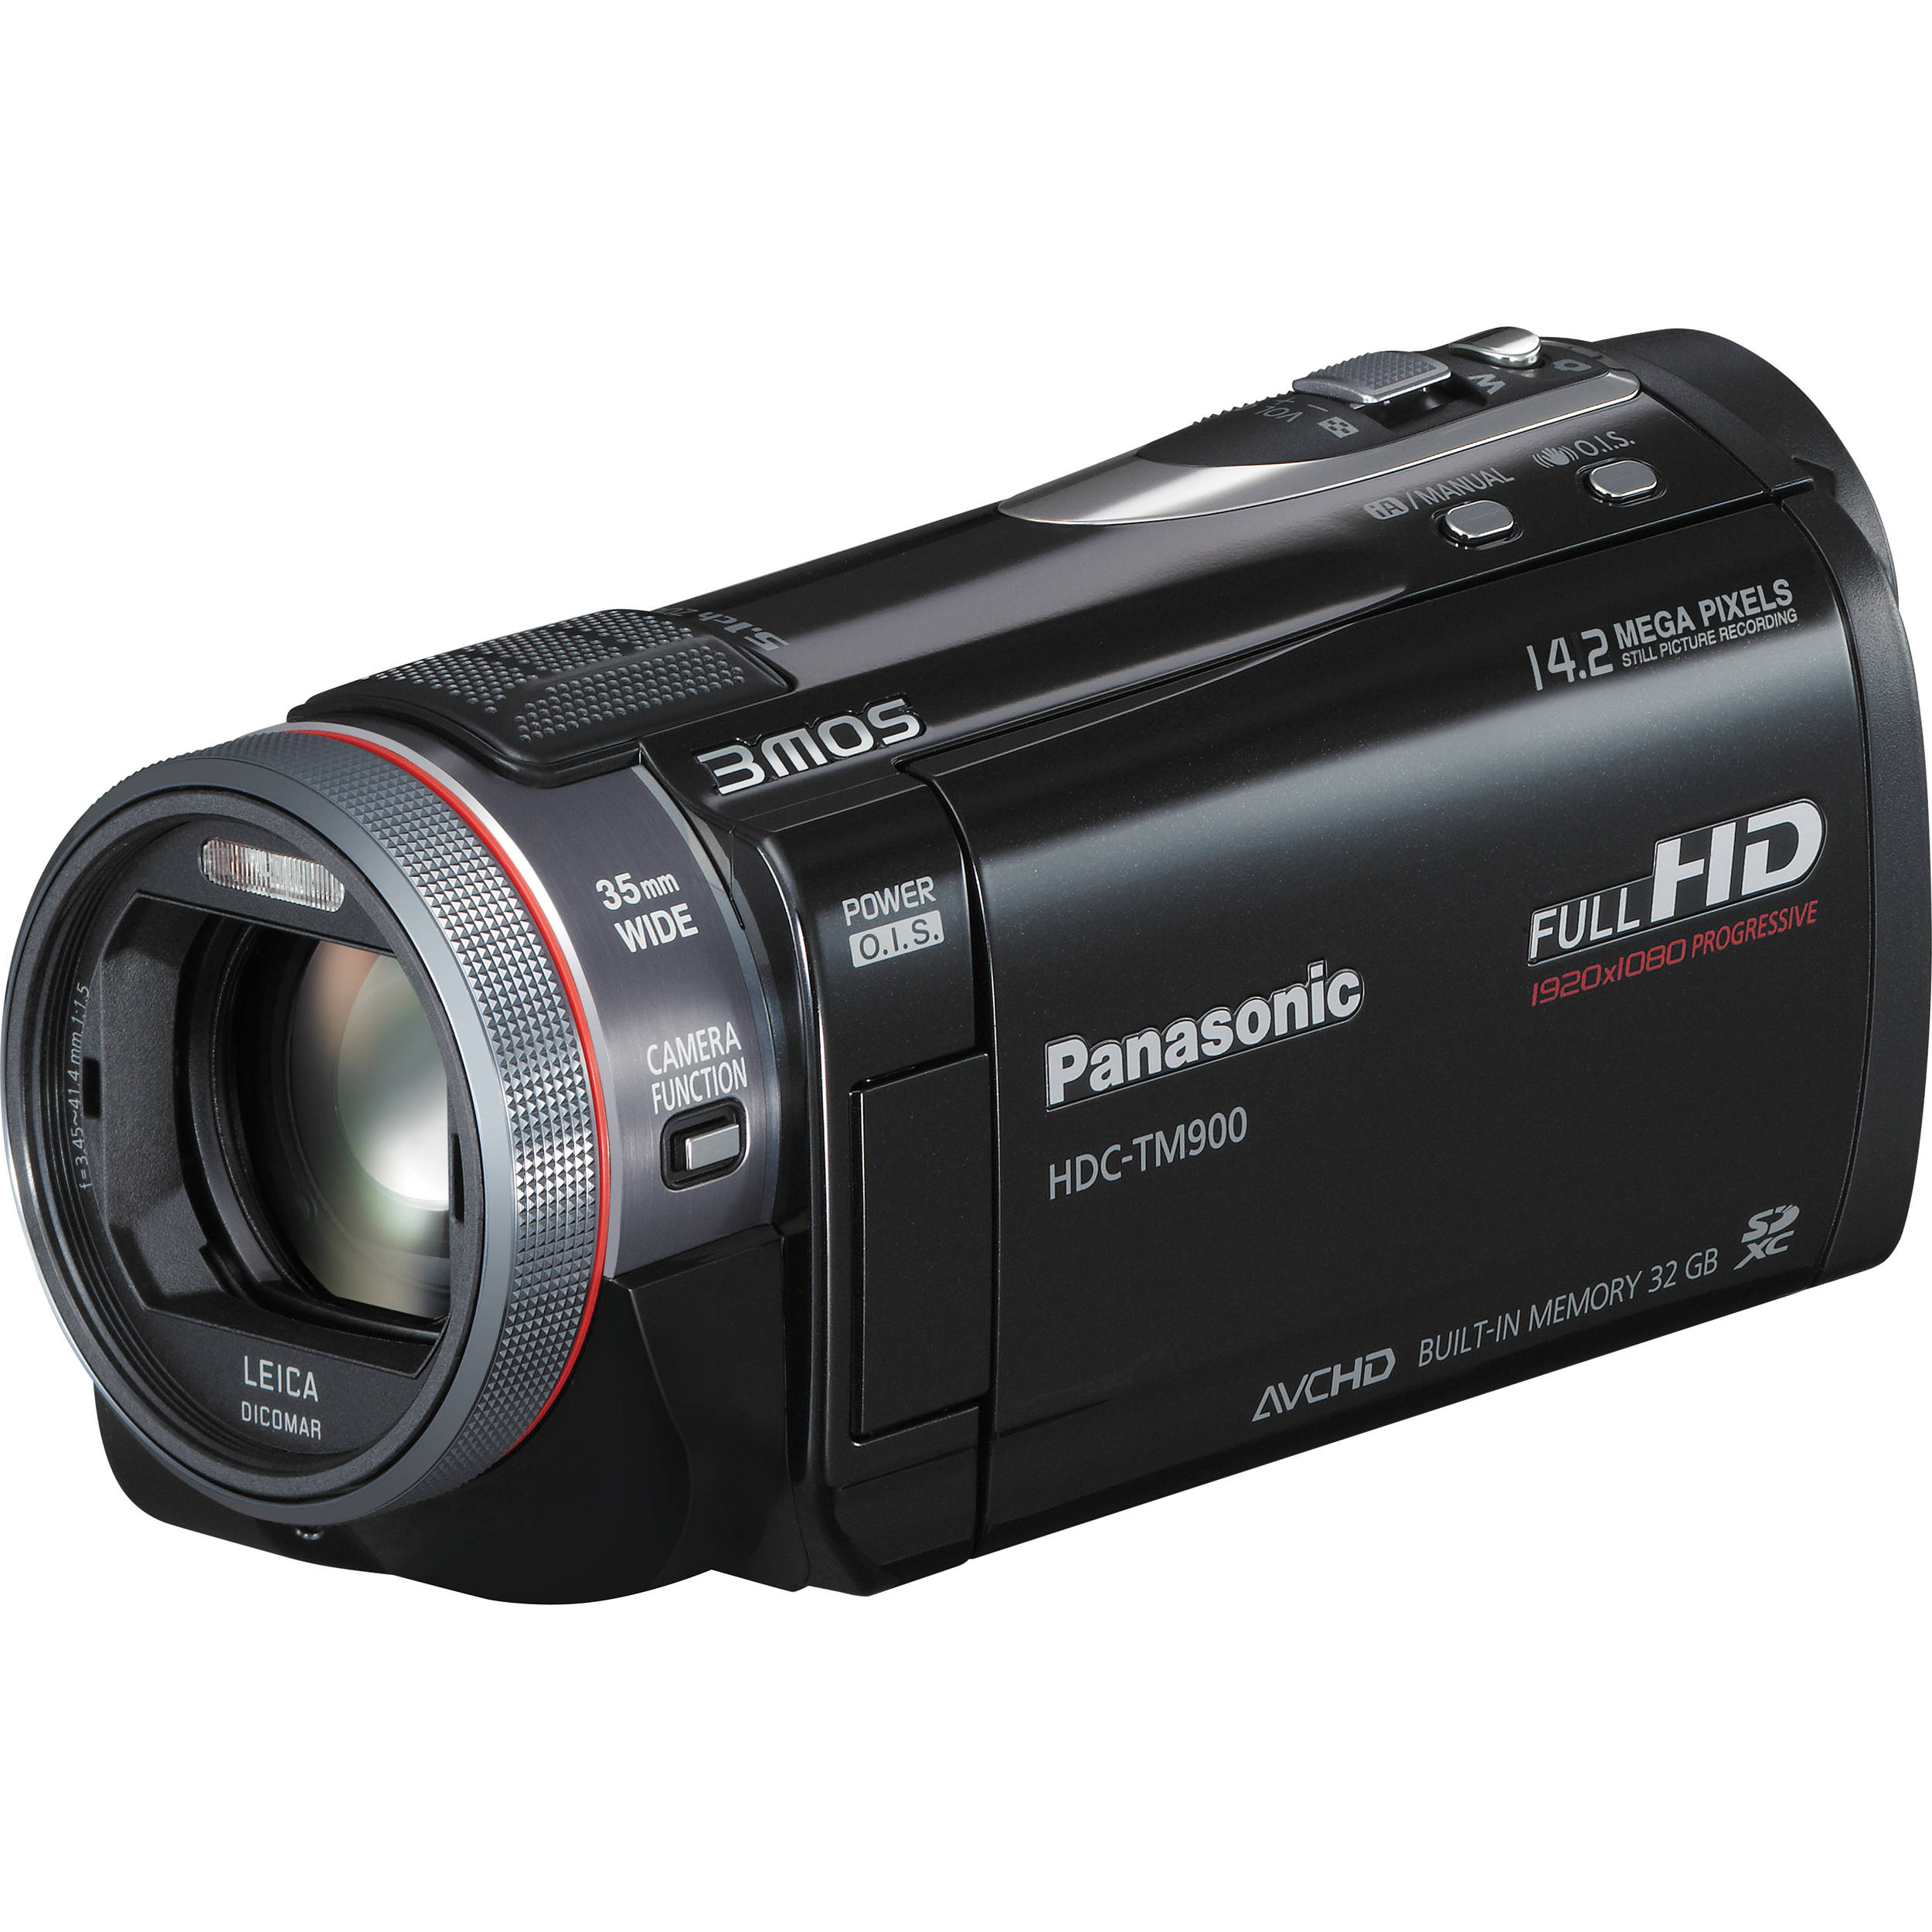 panasonic hdc tm900 high definition pal camcorder hdctm900e b h rh bhphotovideo com Panasonic HDC TM900 Manual Panasonic HDC SD800